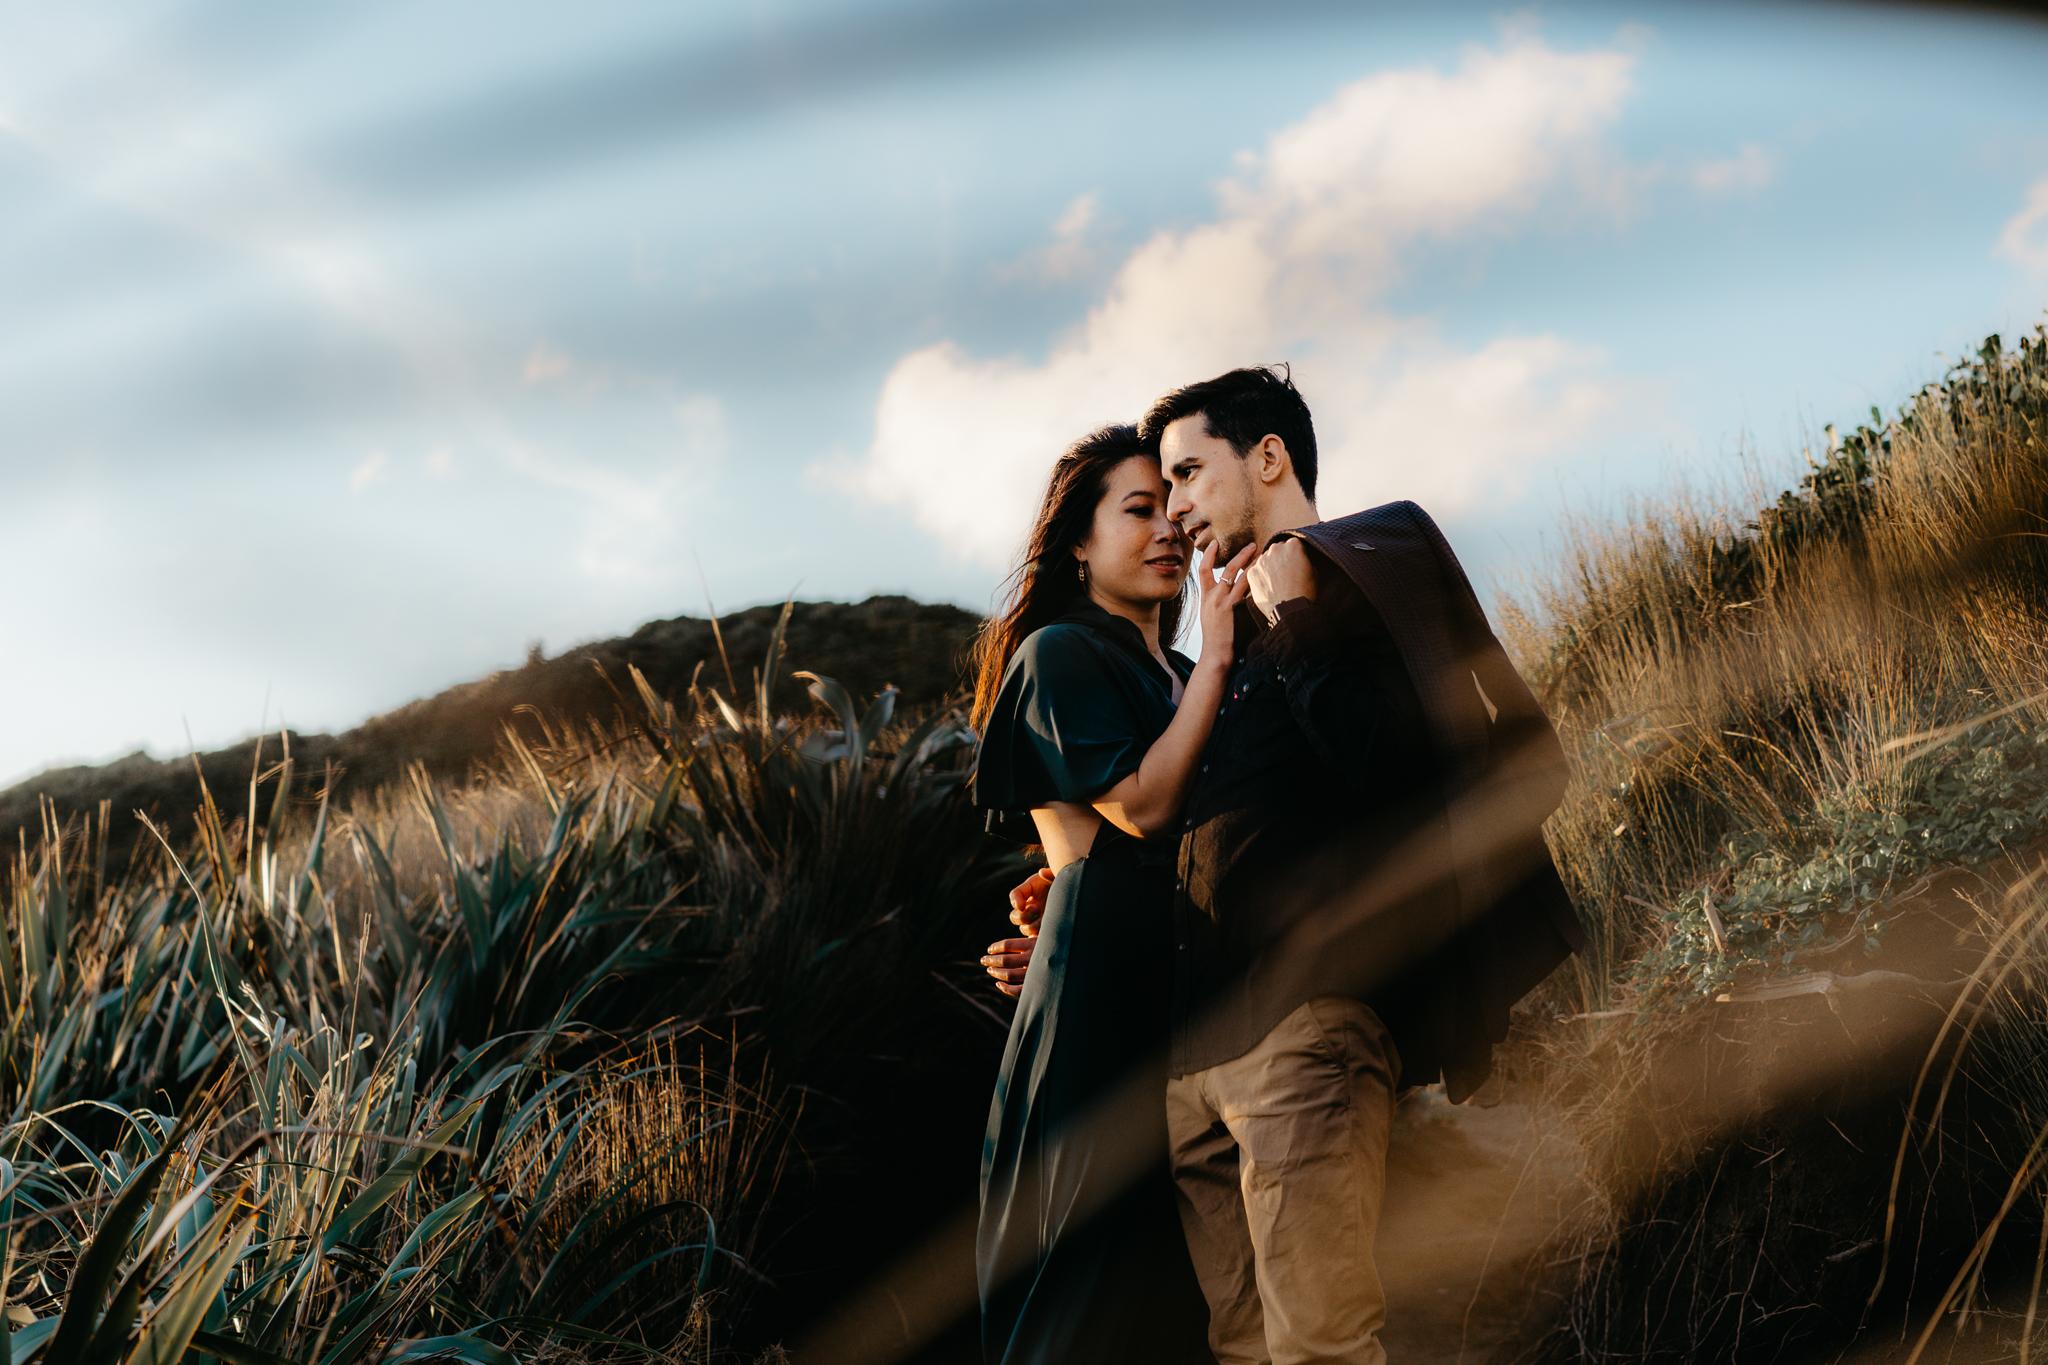 Top Auckland Palmerston North Wellington NZ Photographer New Zealand Wedding Elopement Destination Candid Special Wedding Photographer Photography Couple Engaged Engagement Style Love Piha Beach